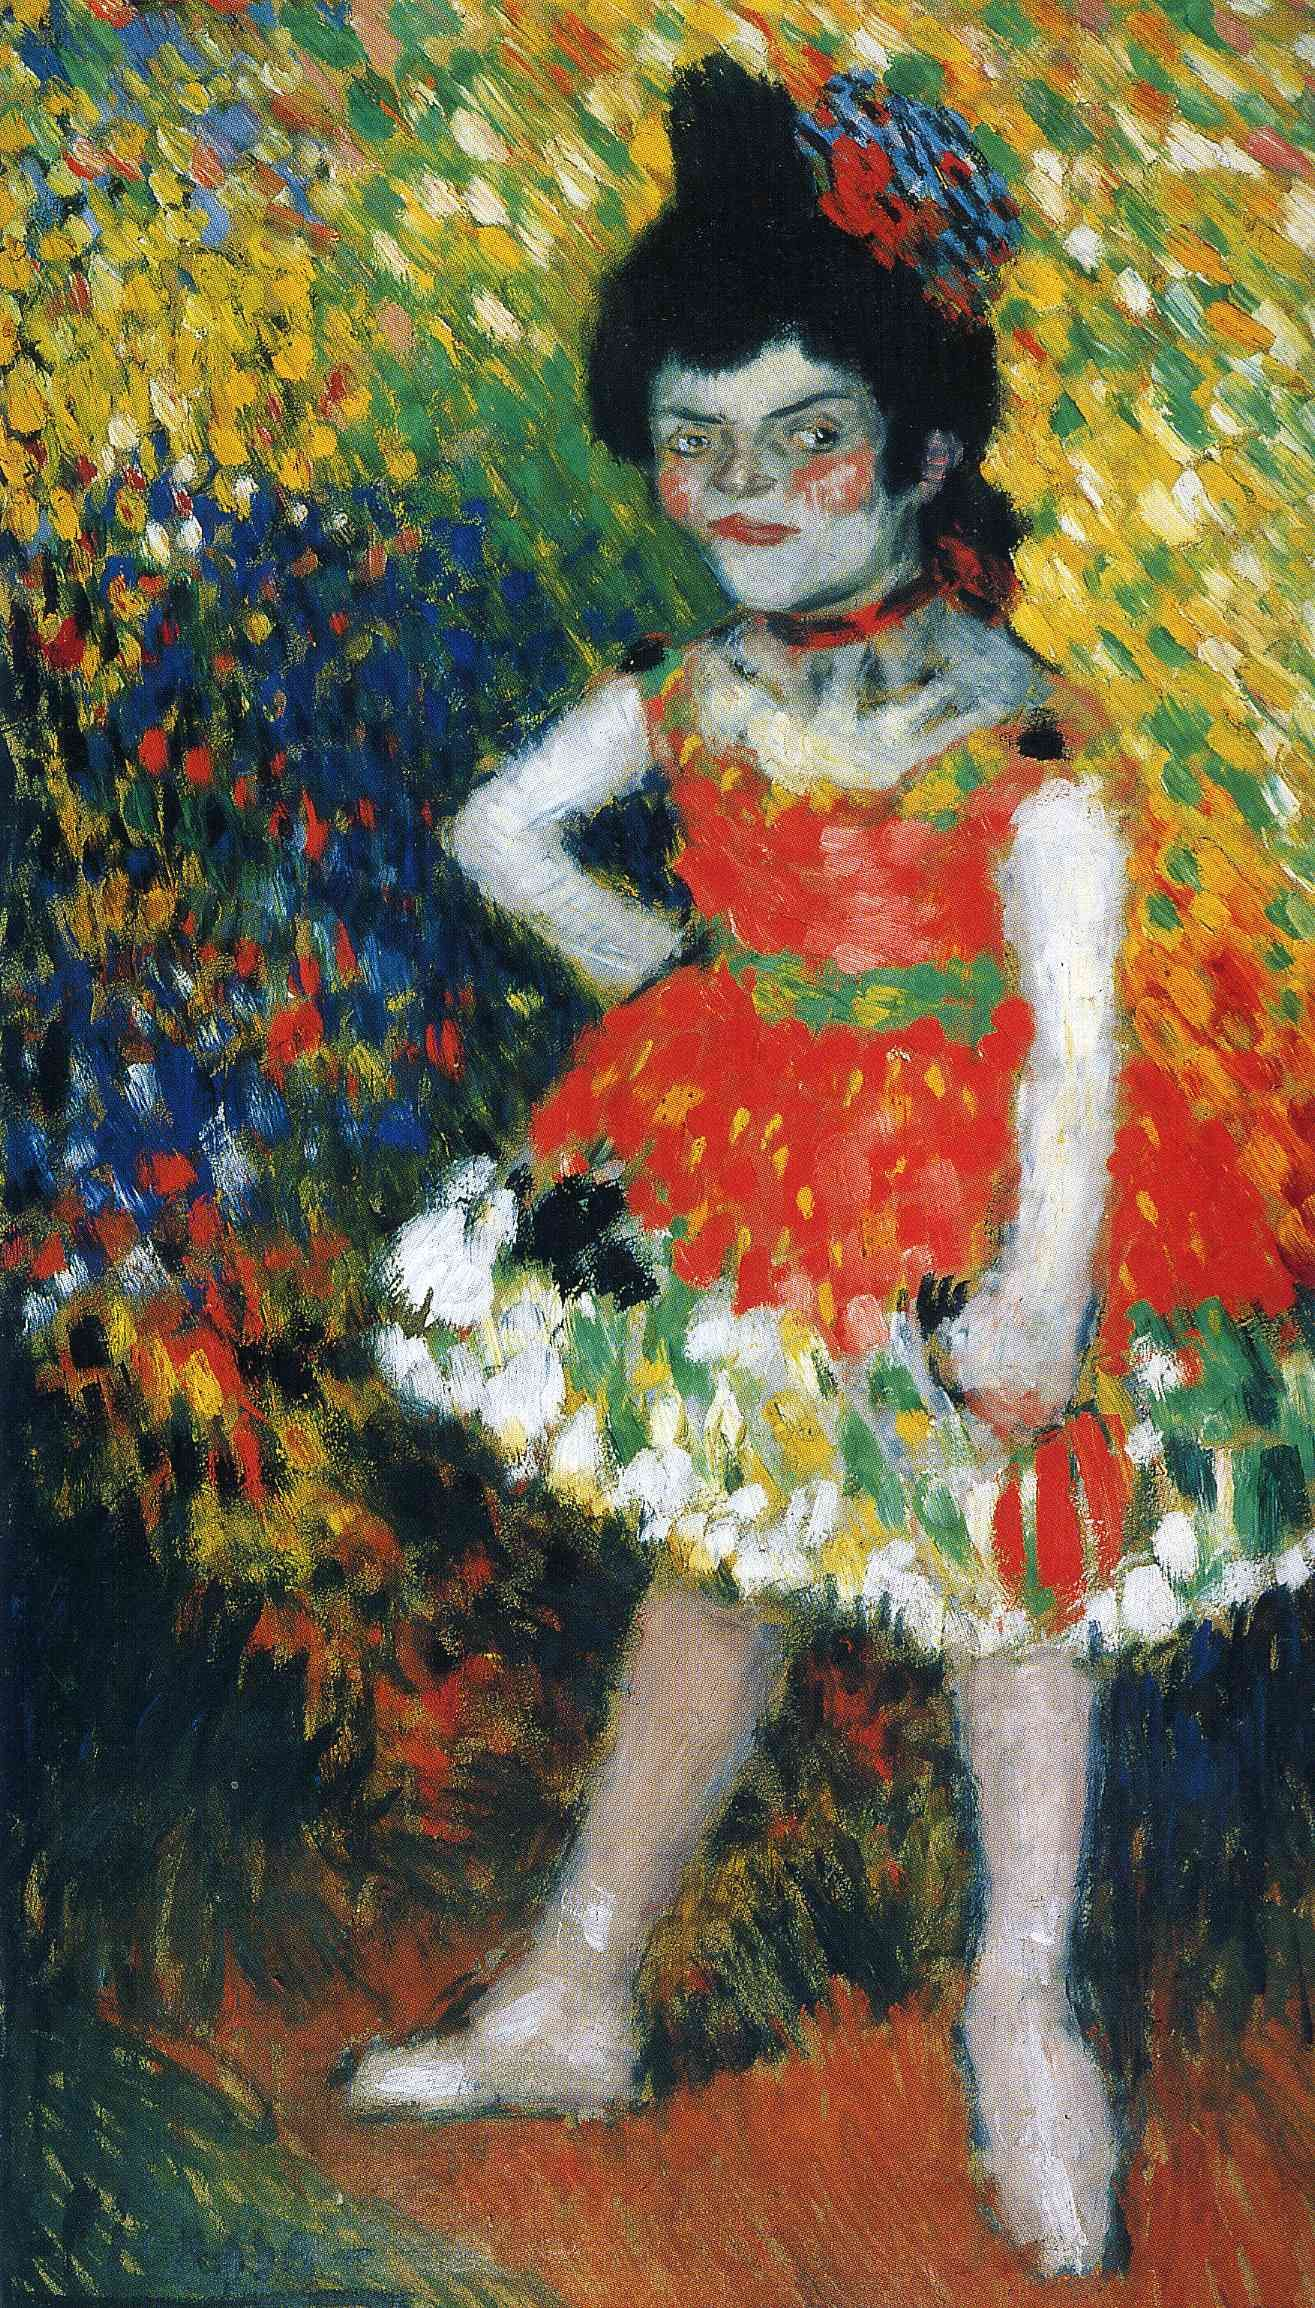 Nana Pablo Picasso Spaanse Kunst Impressionisme 2d Kunst